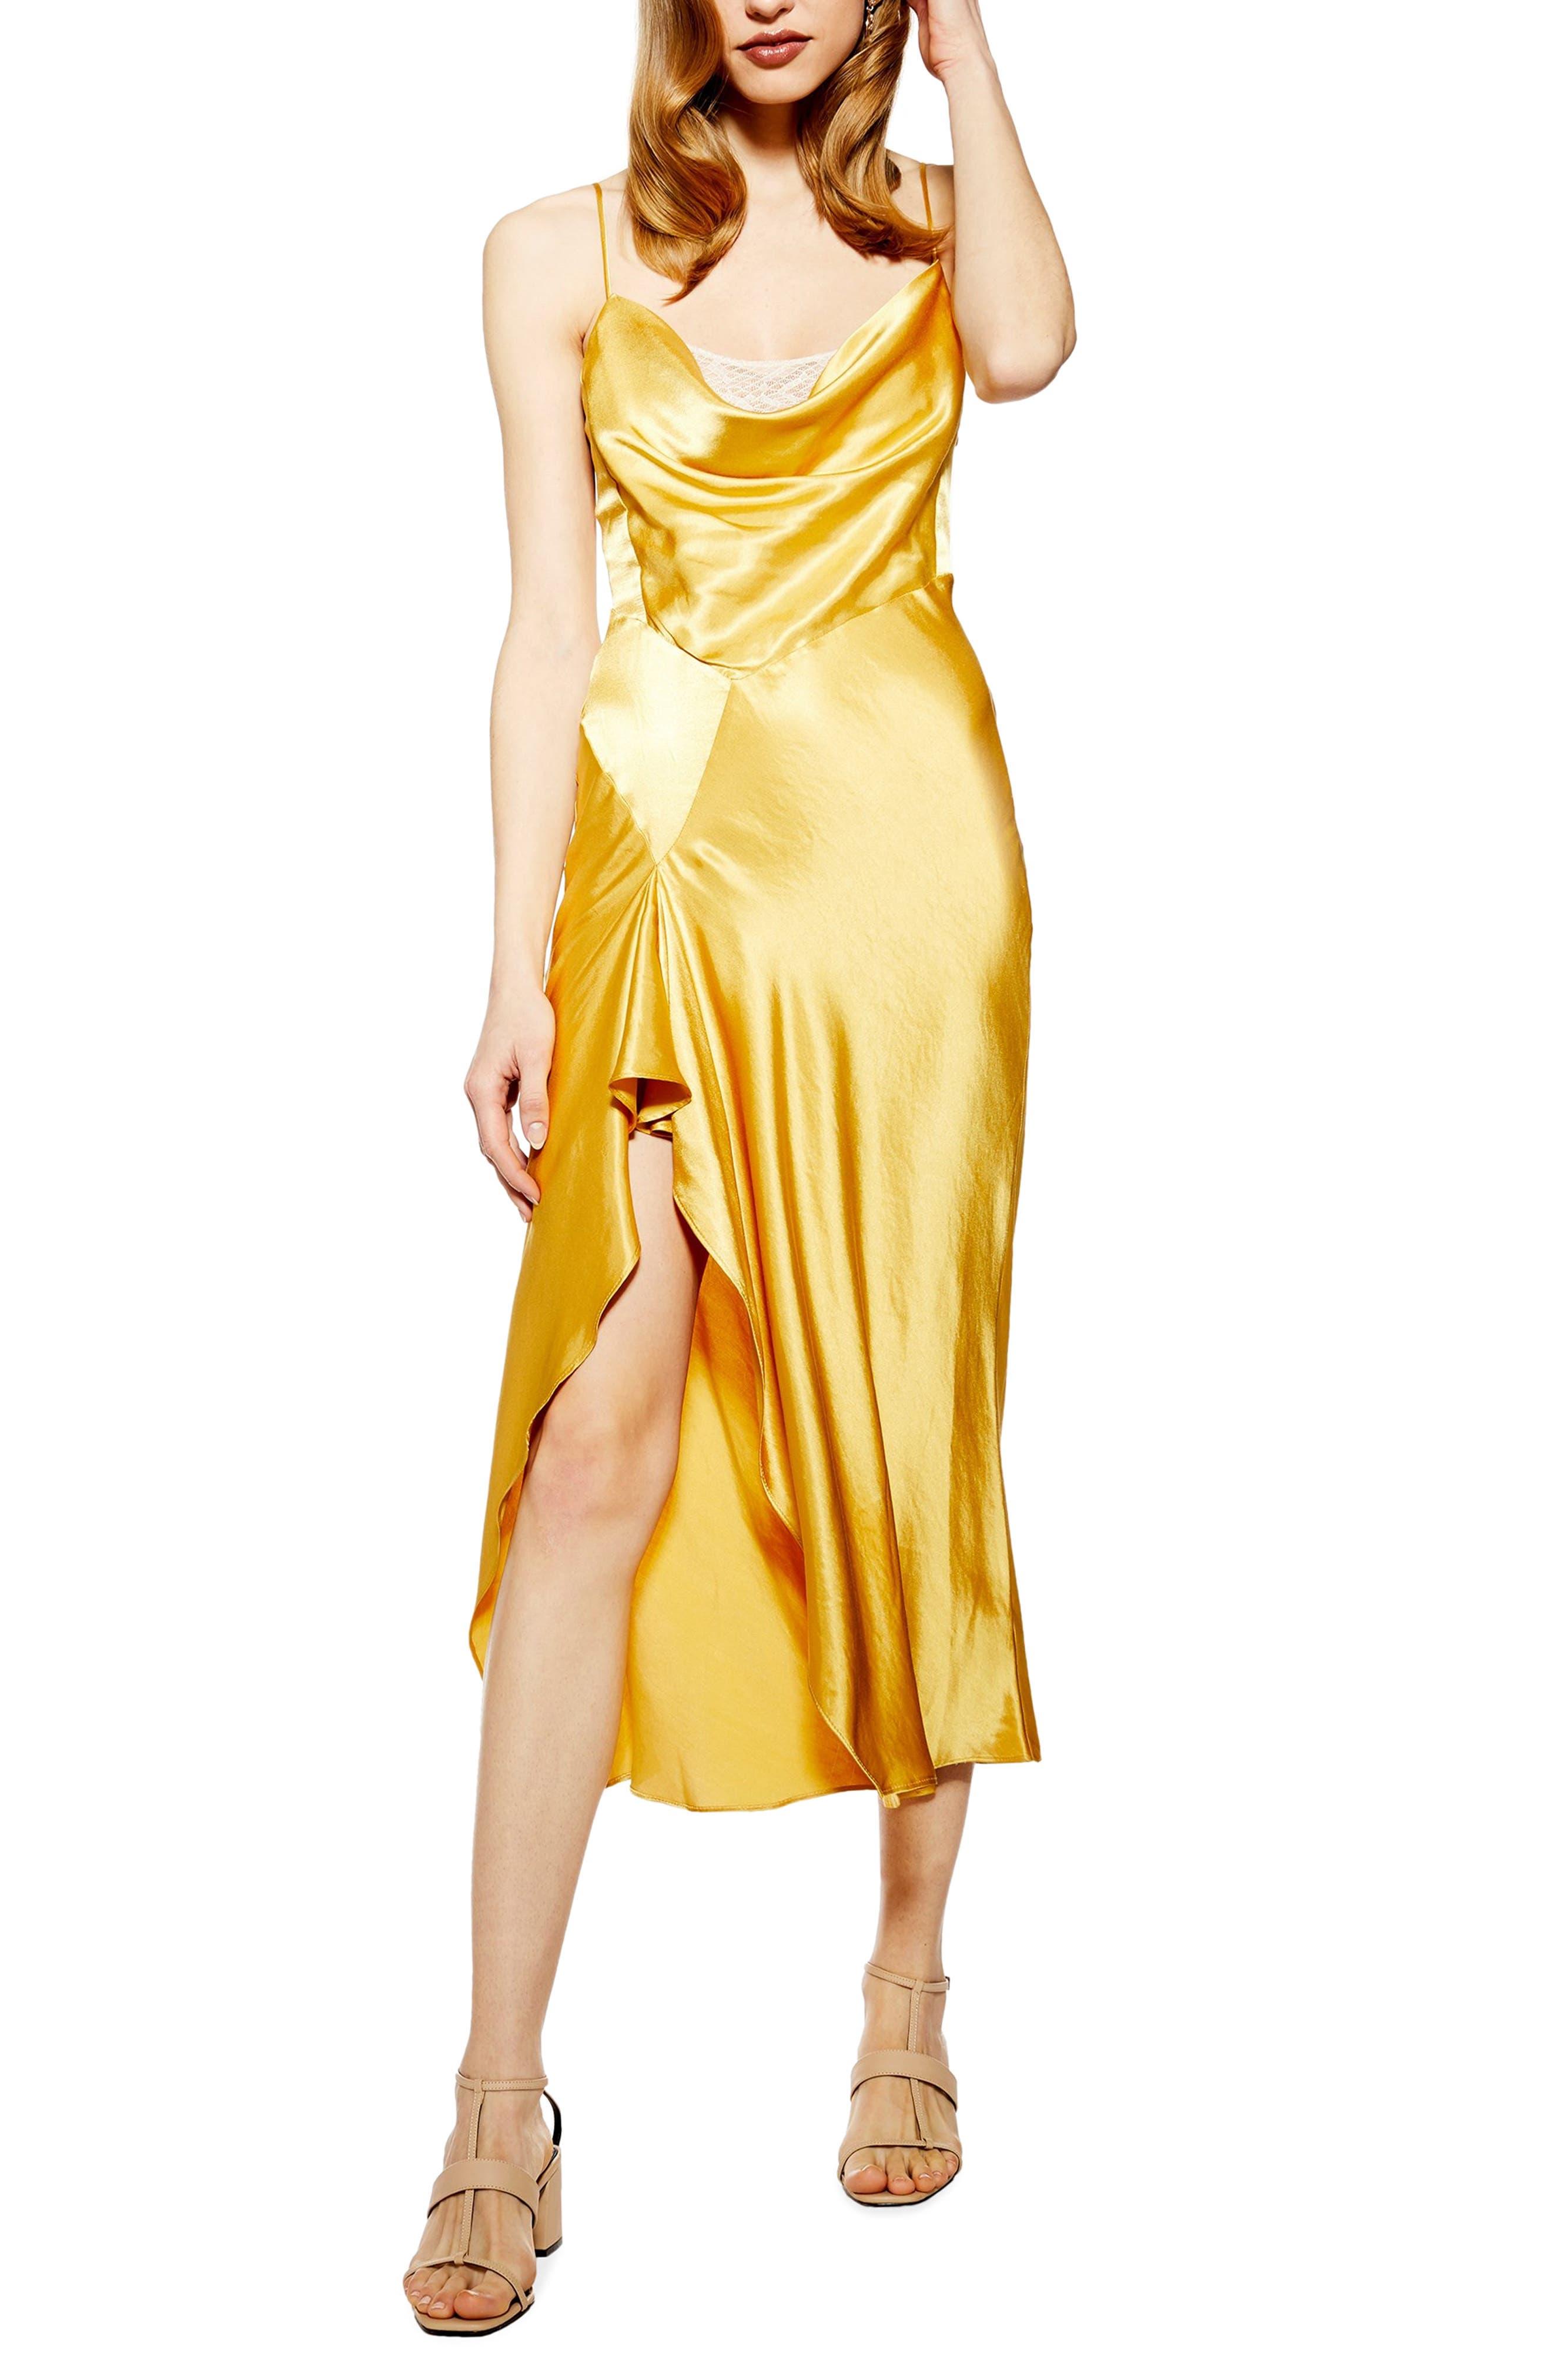 Topshop Lace Back Satin Slipdress, US (fits like 0) - Yellow